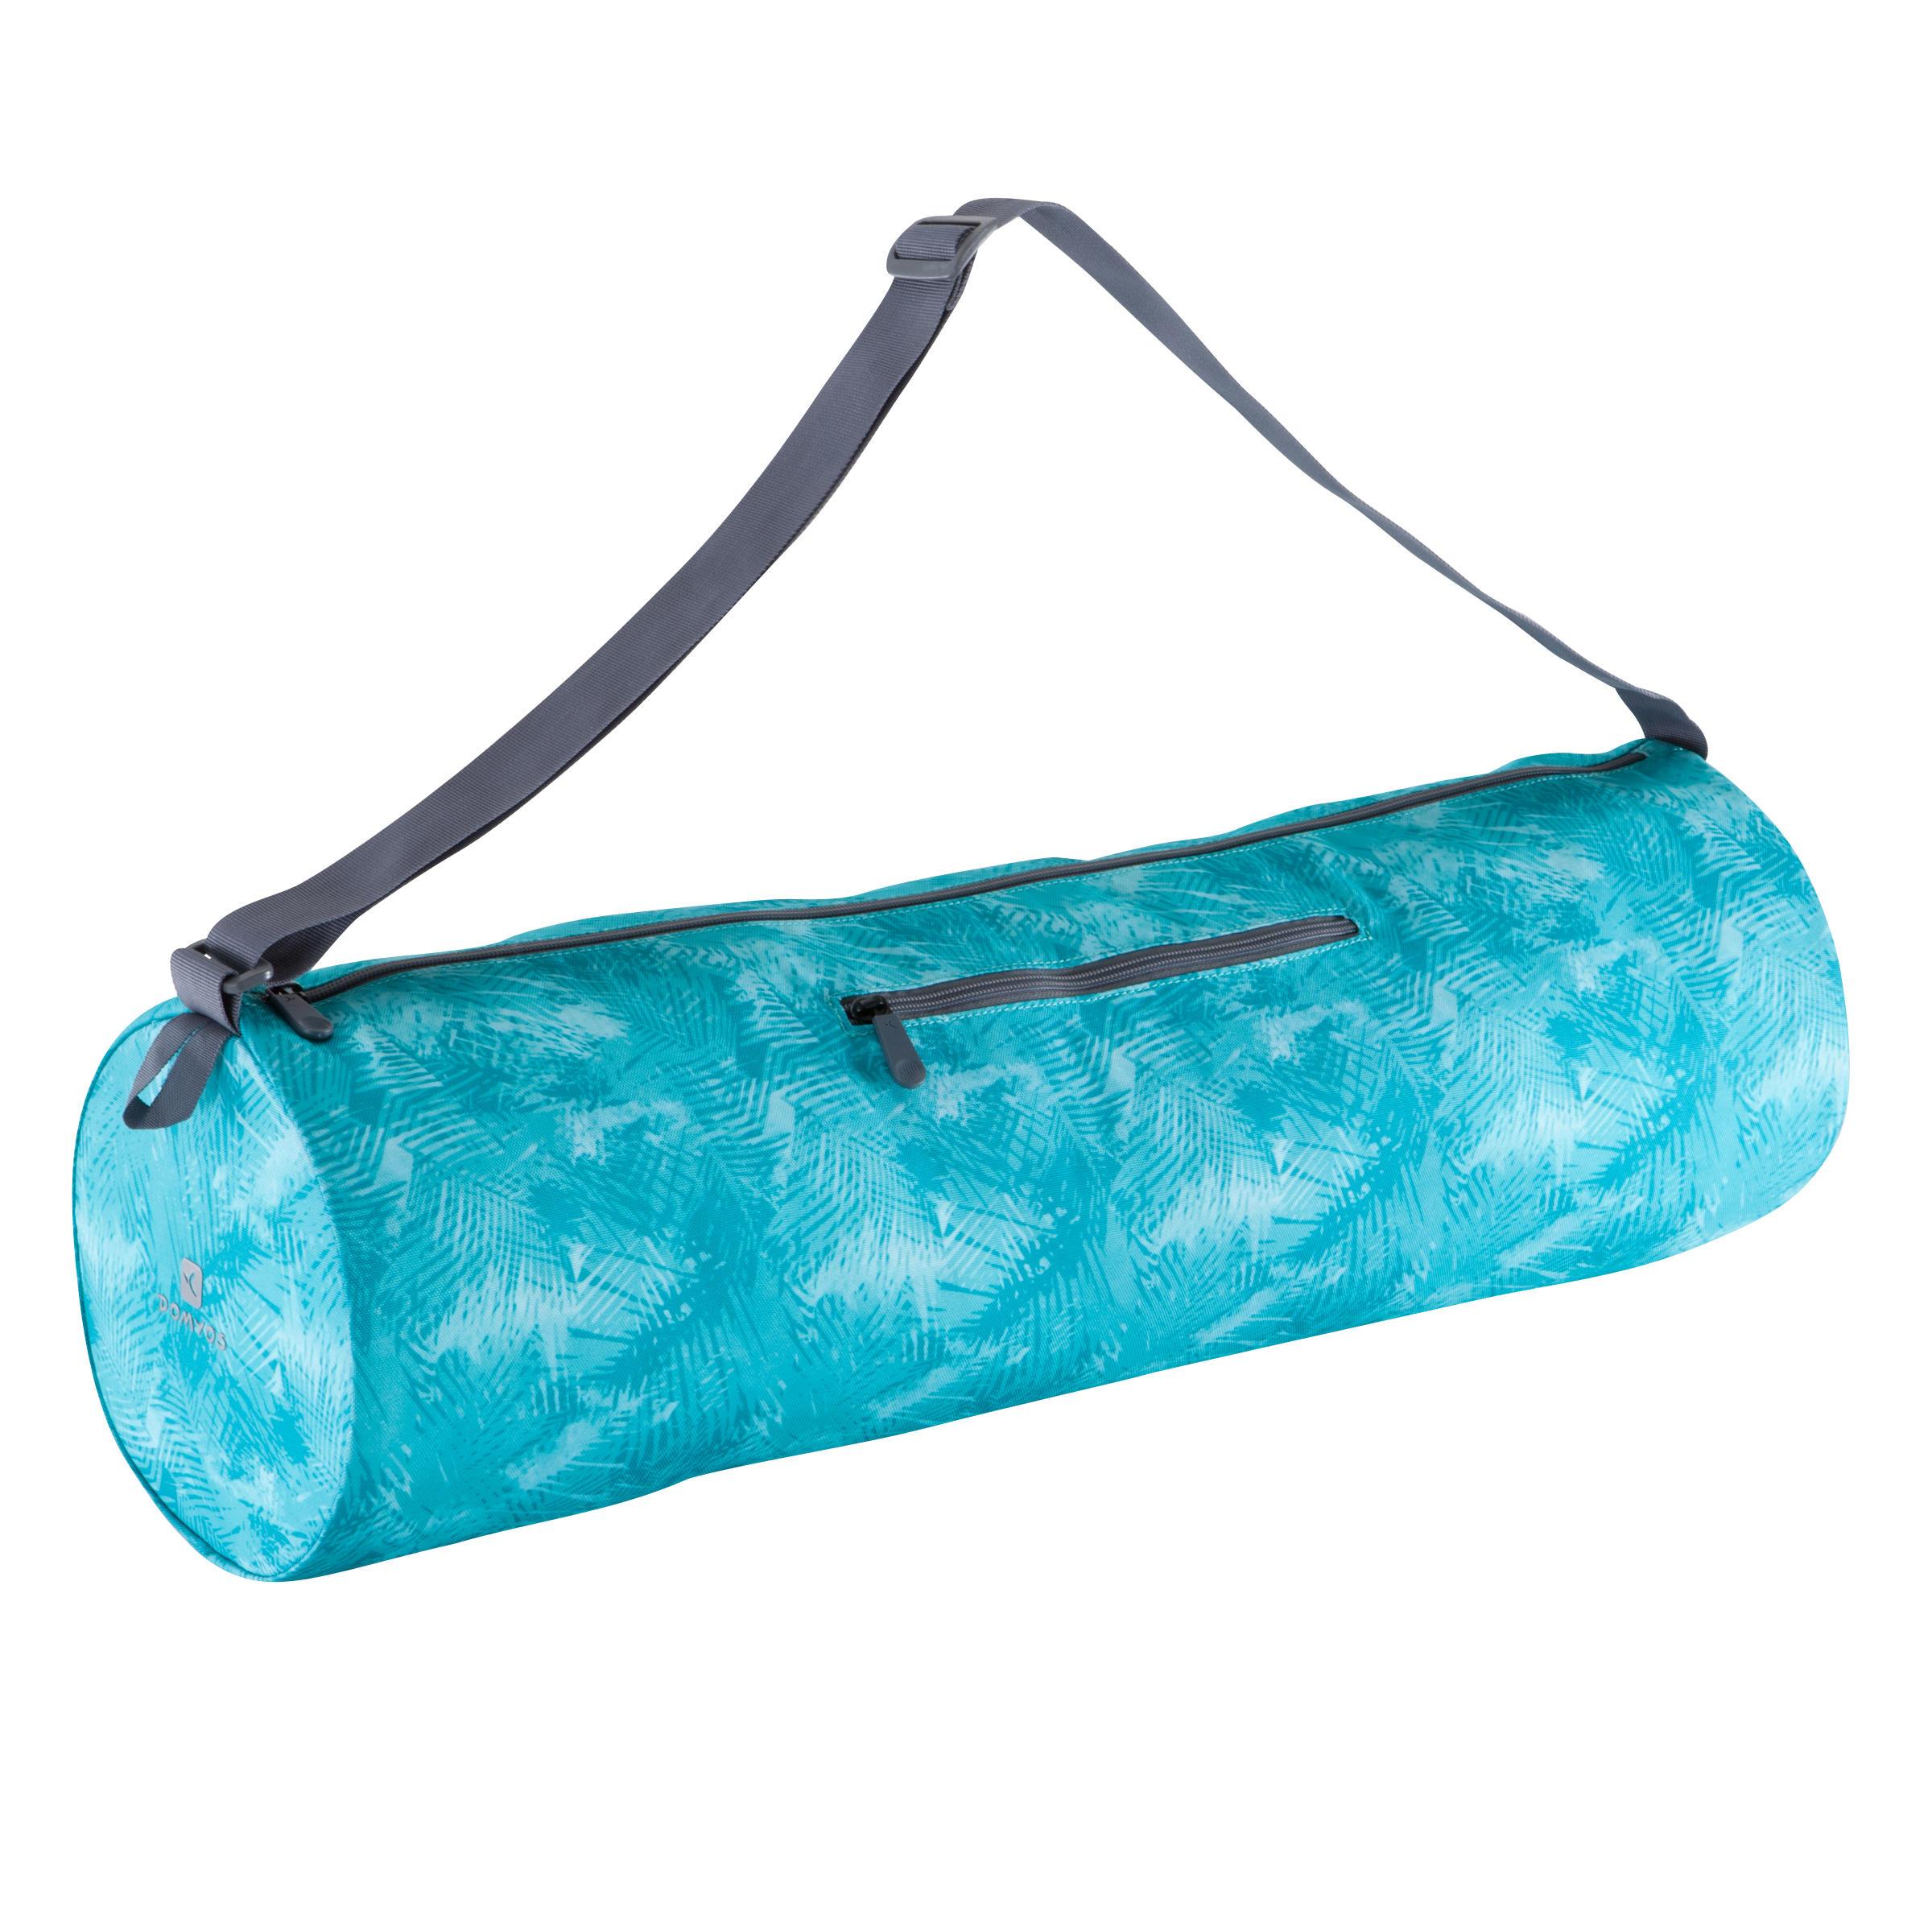 Tas yogamat blauw print